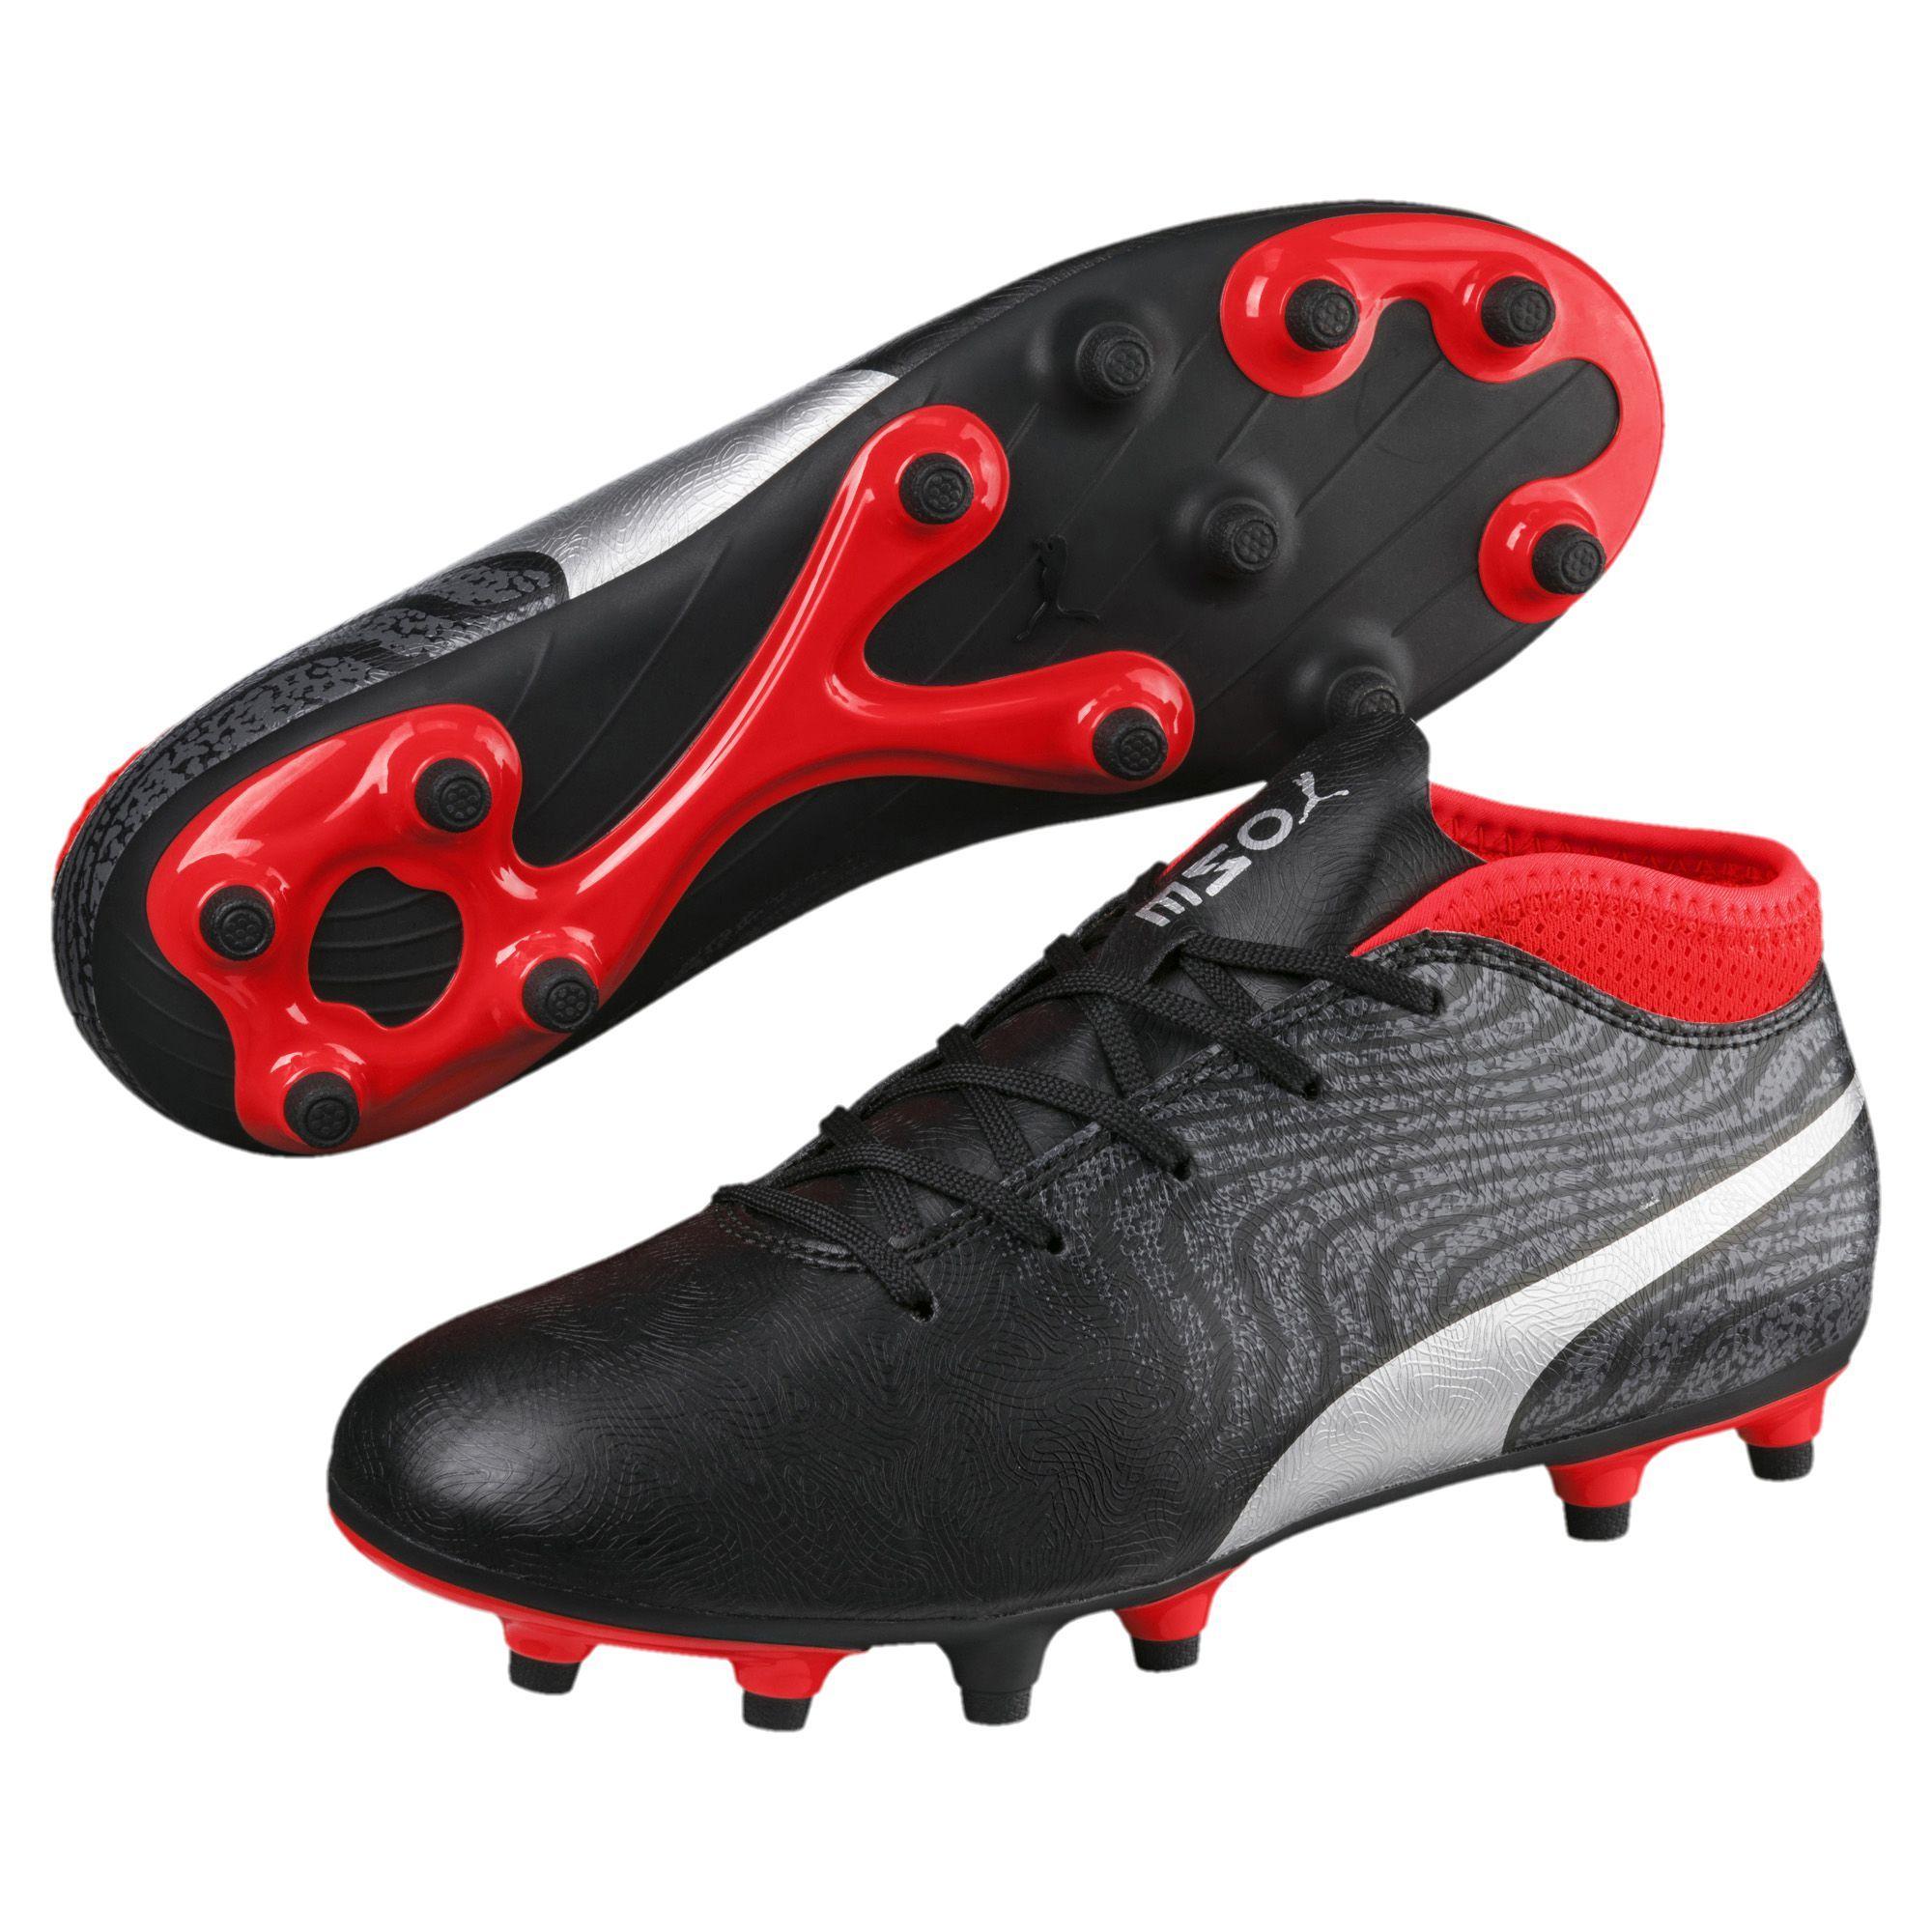 a4940ba9df6  29.99 PUMA ONE 18.4 FG Kids  Soccer Cleats Boys Low Boot Football New Kids  Soccer